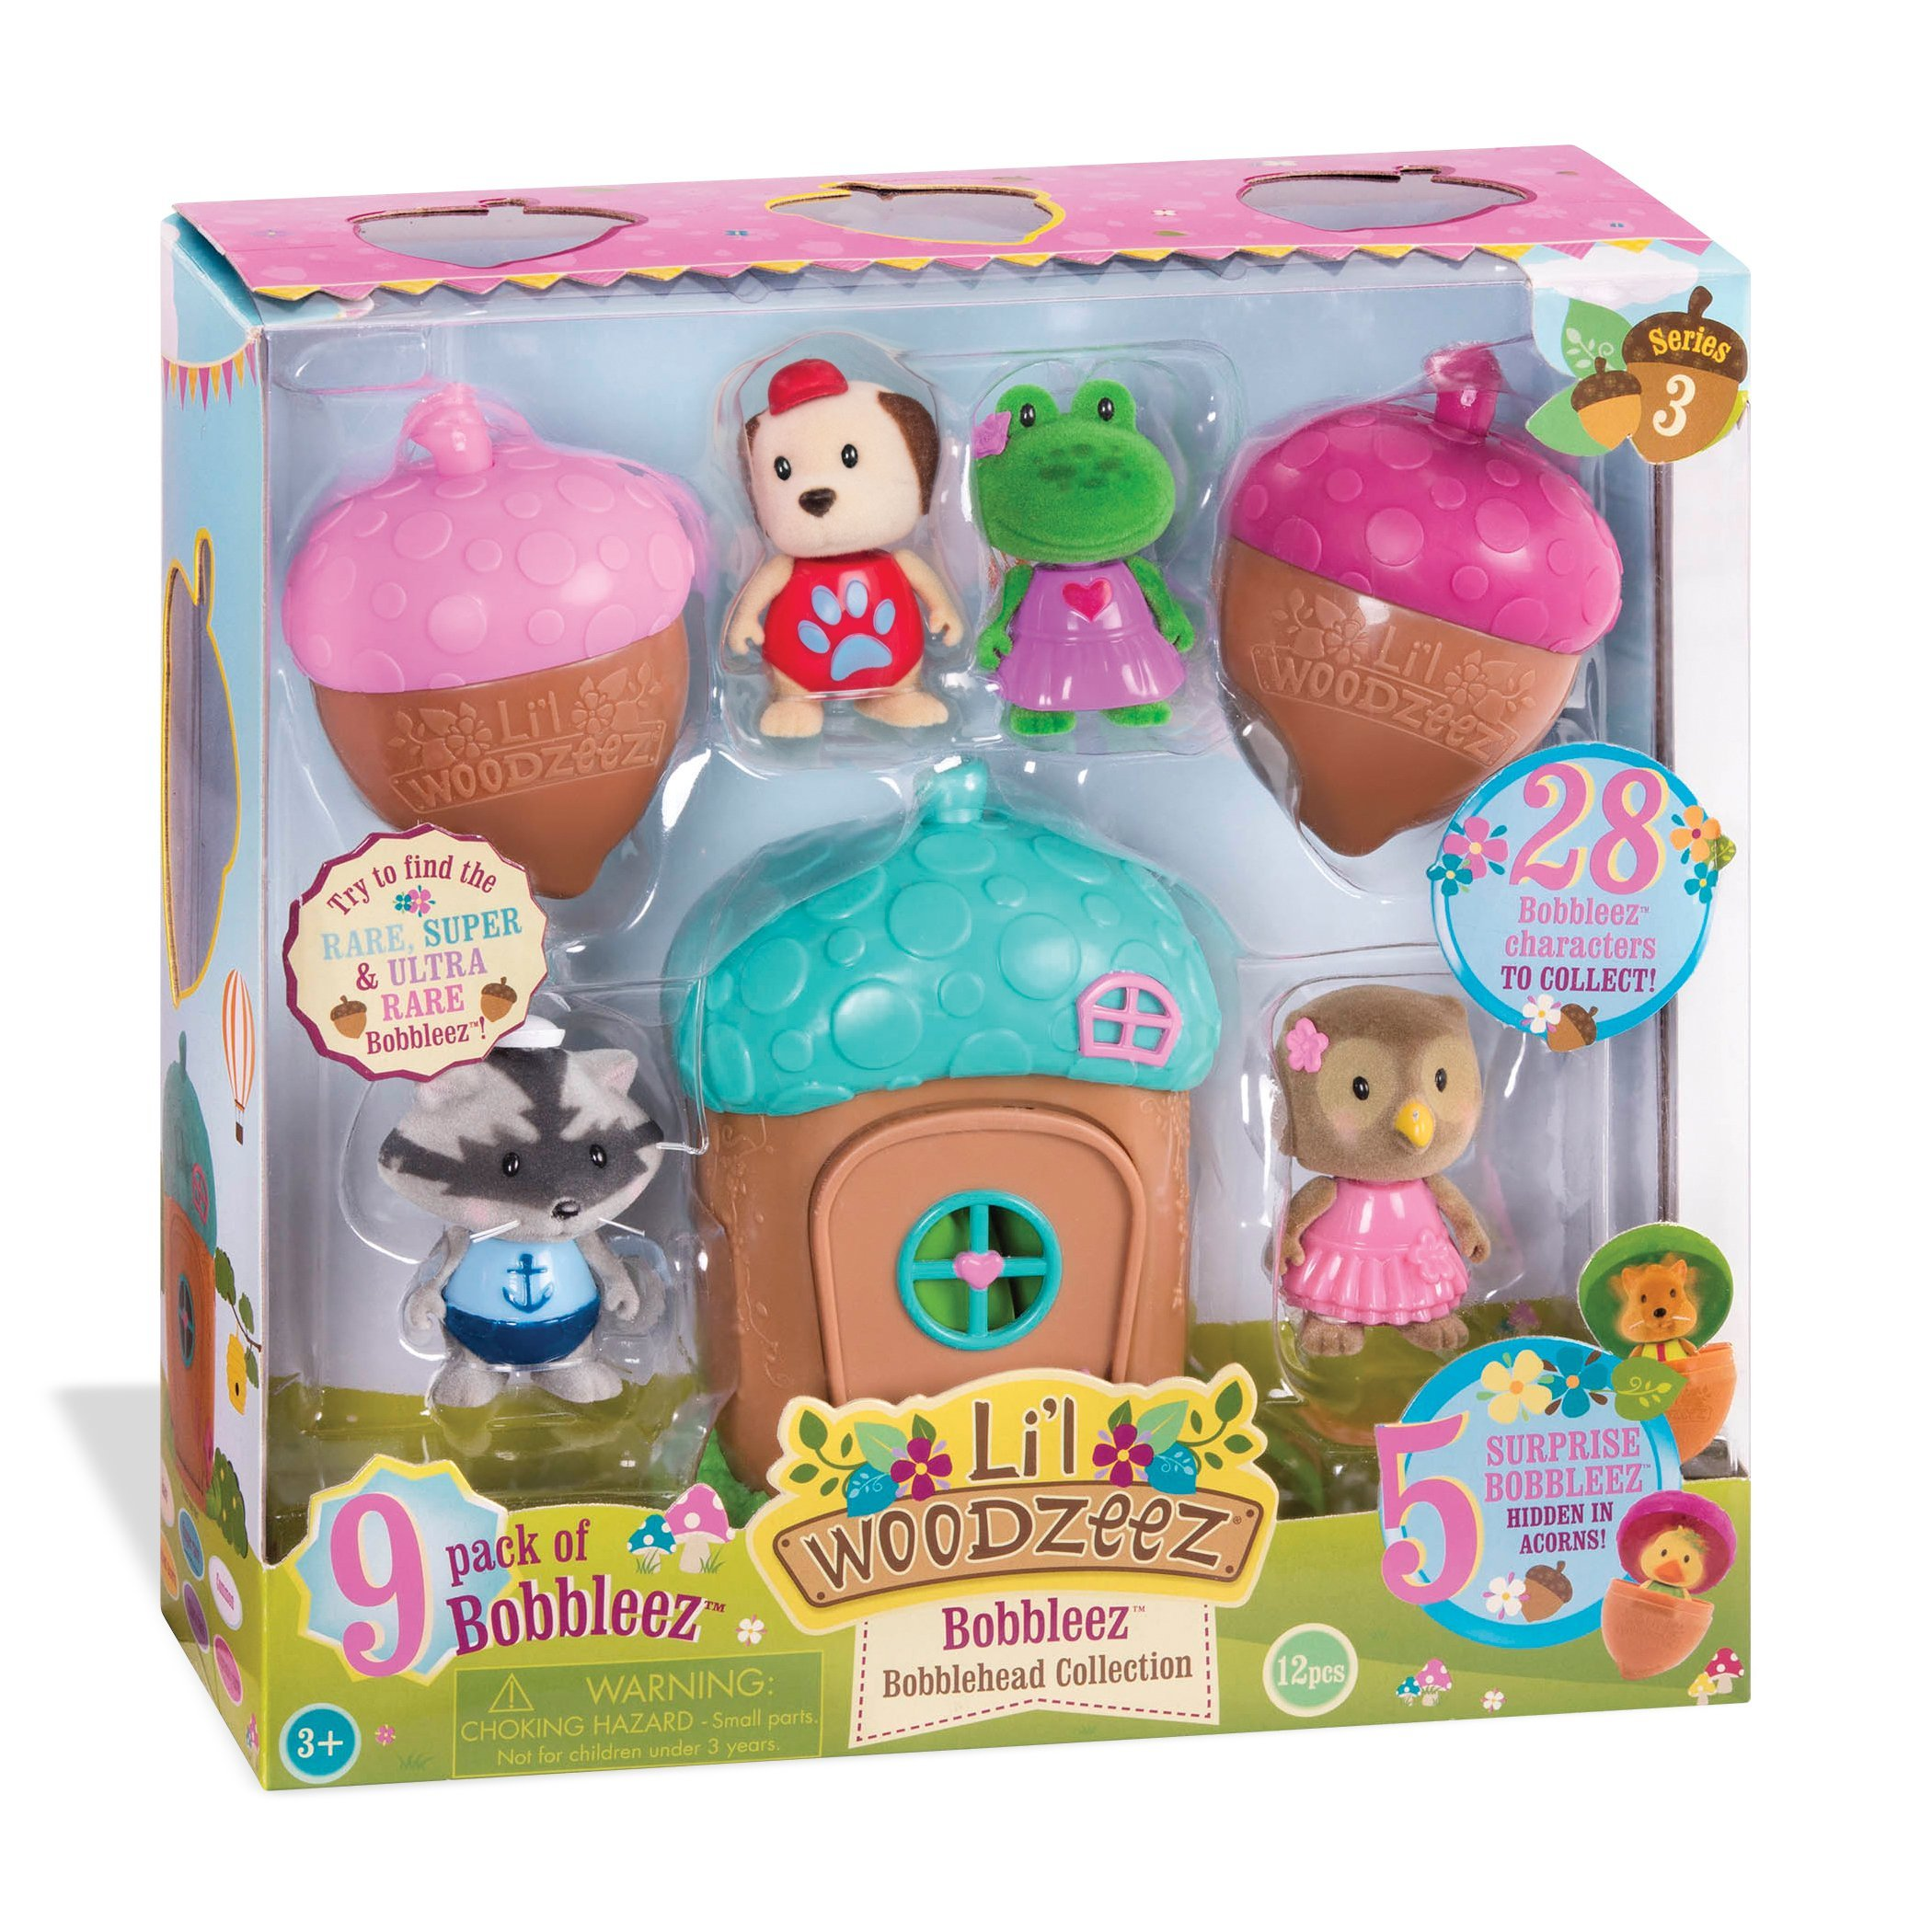 Li L Woodzeez Bobblehead Series 3 9 Pack Assortment Toy Buy Online In Grenada At Grenada Desertcart Com Productid 109421909